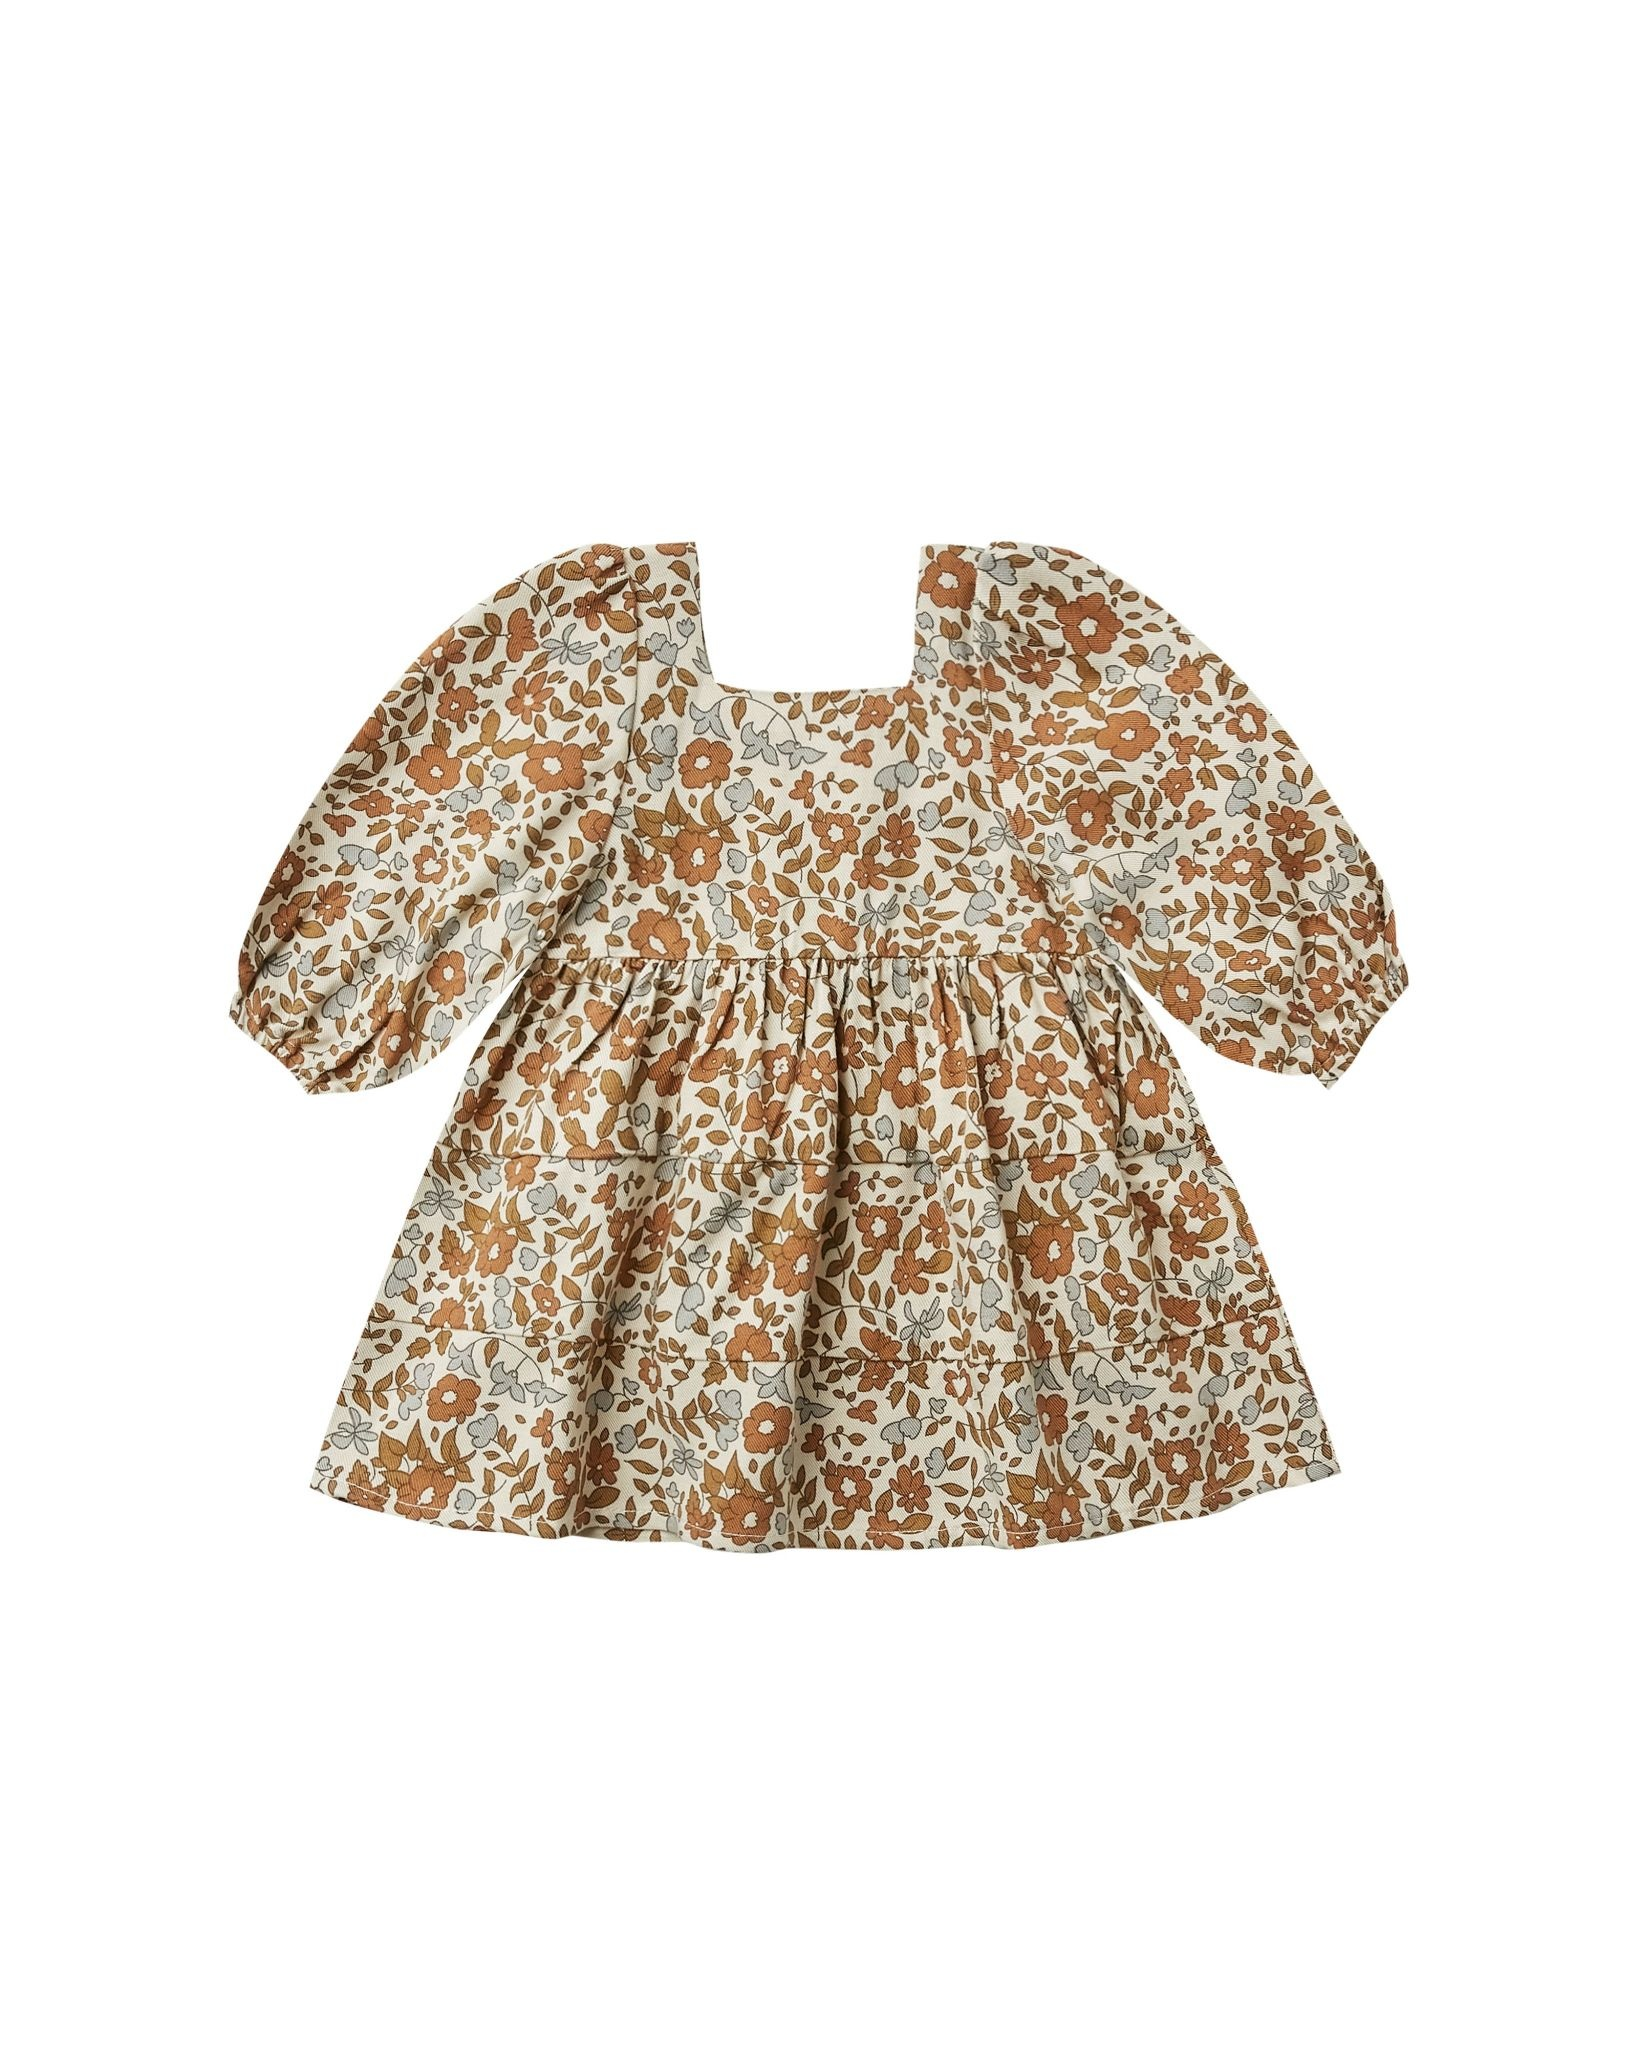 Rylee & Cru Gretta Dress - Bloom